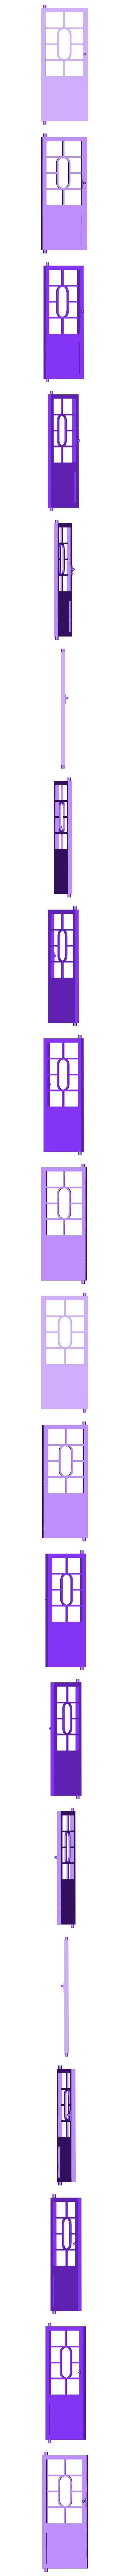 door1.stl Download free STL file Cereal box, Baroque house • Model to 3D print, Steedrick